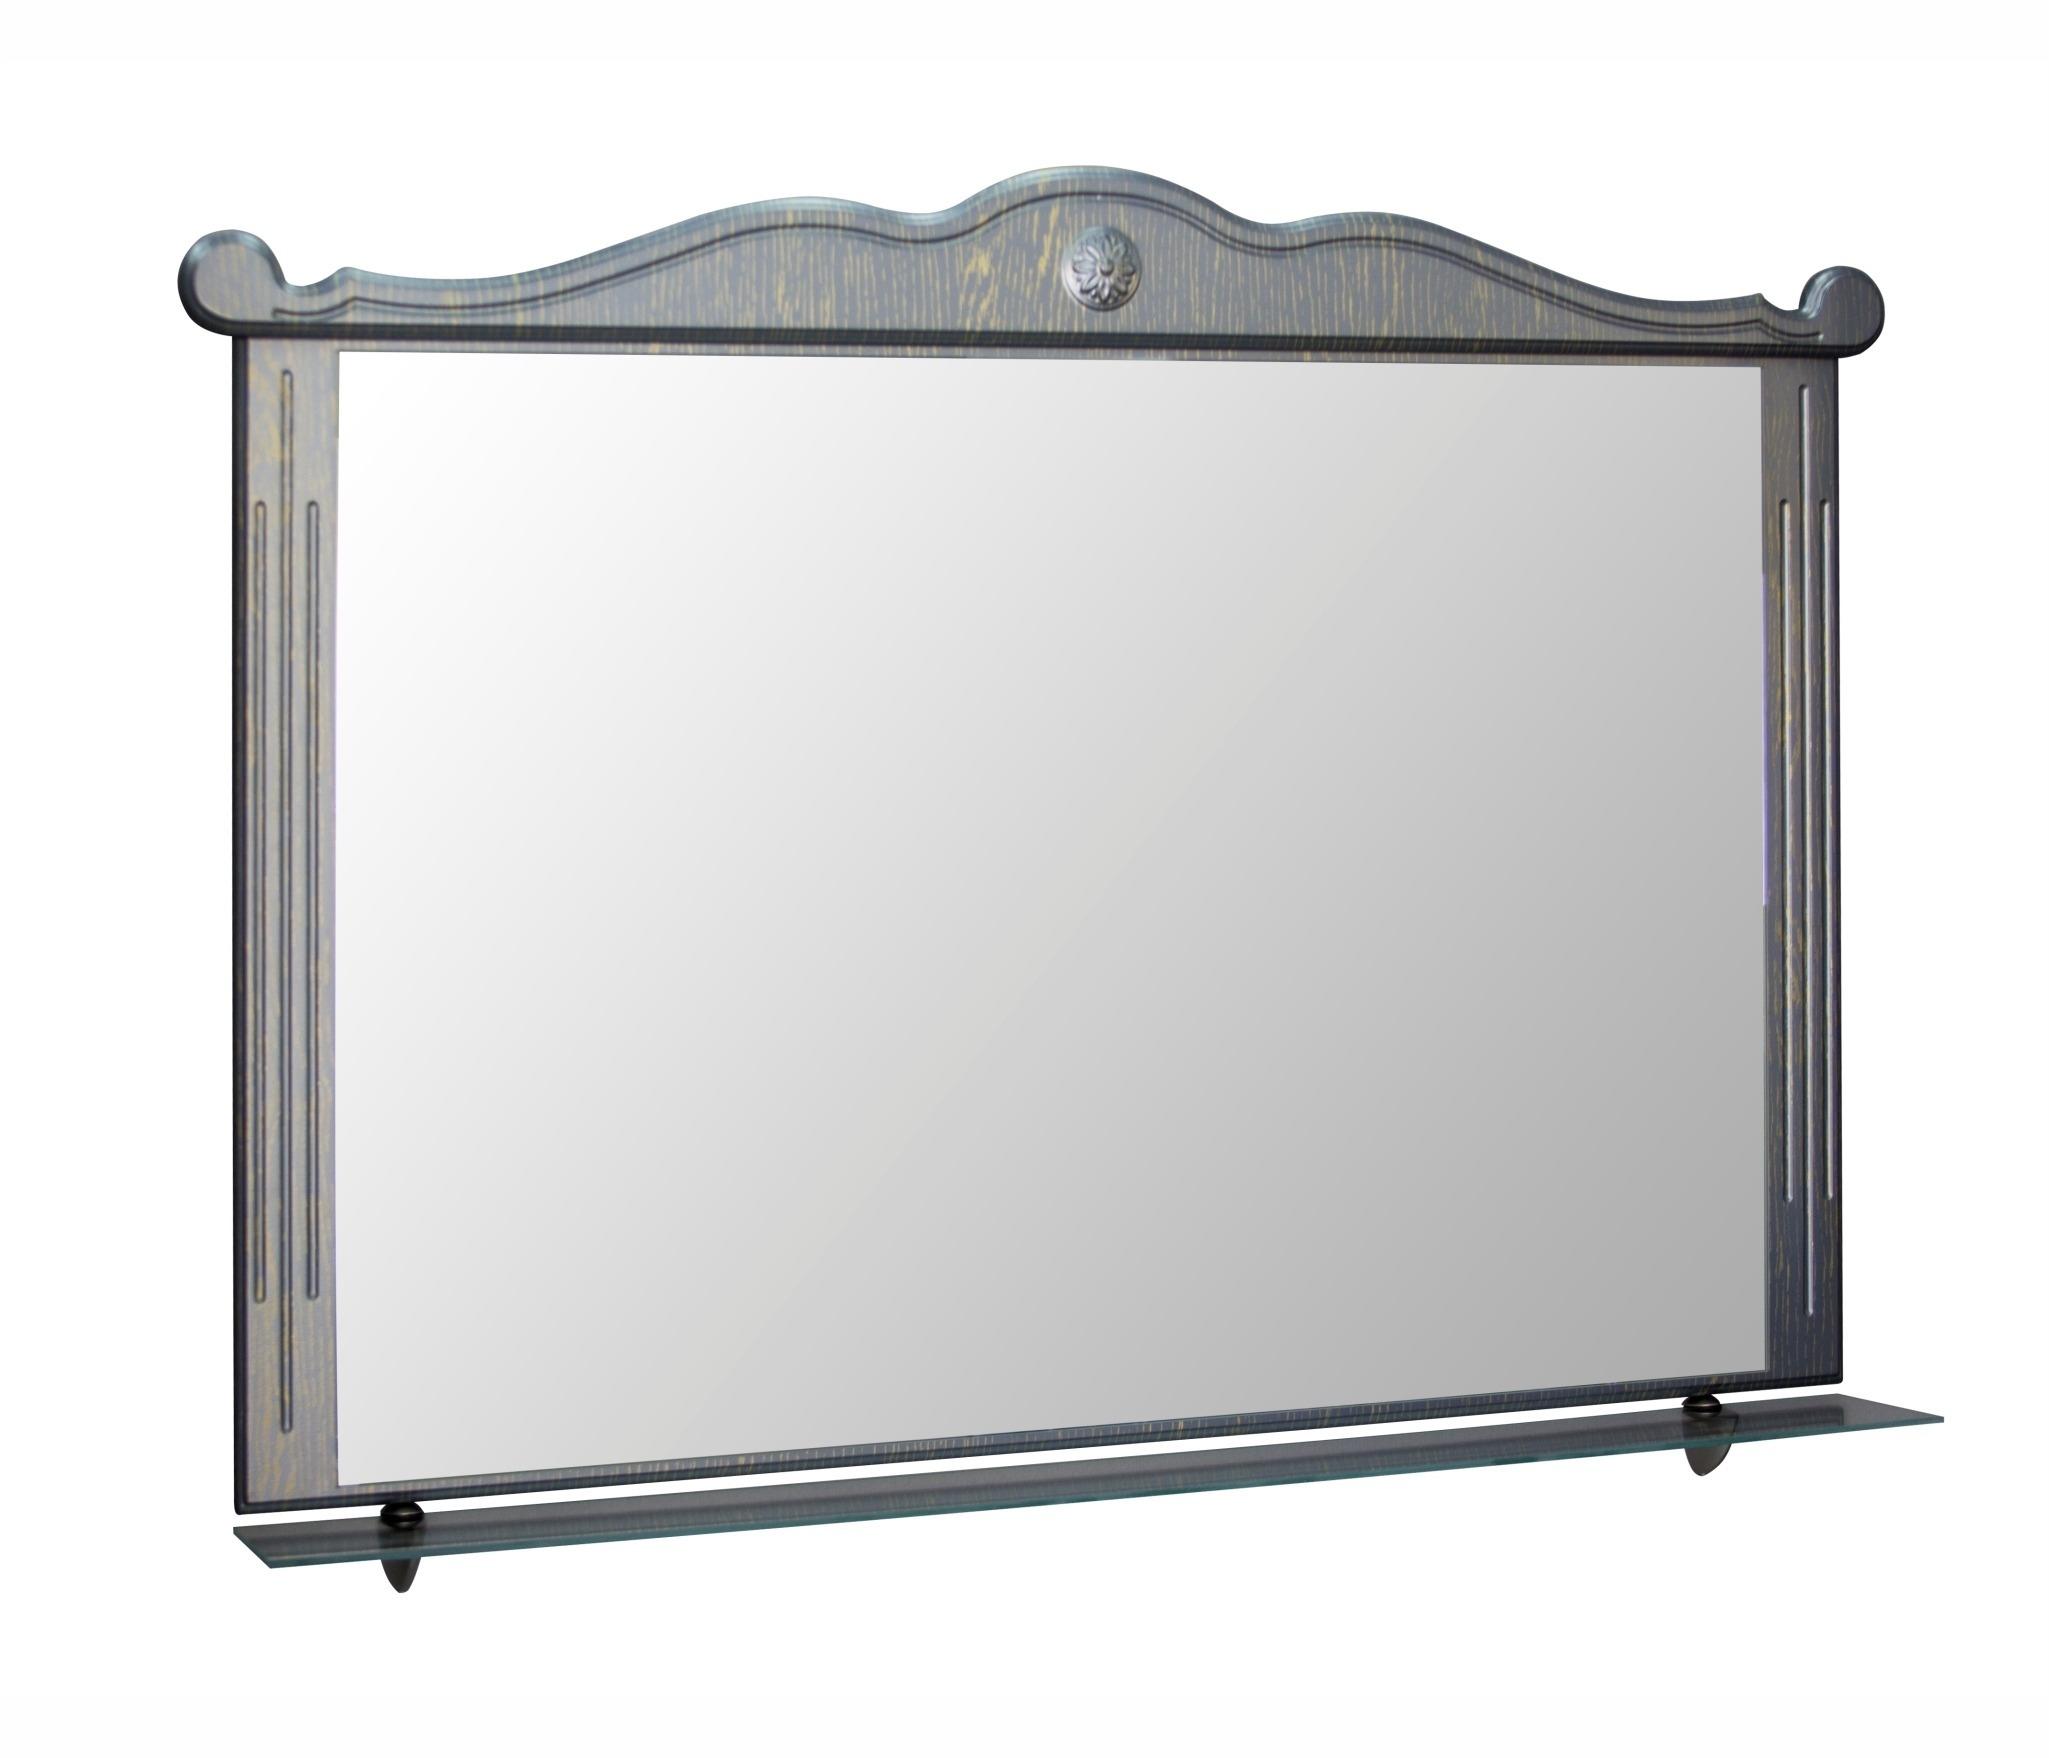 Зеркало ПРОВАНС-105 черный без подсветки (ПВХ) недорого